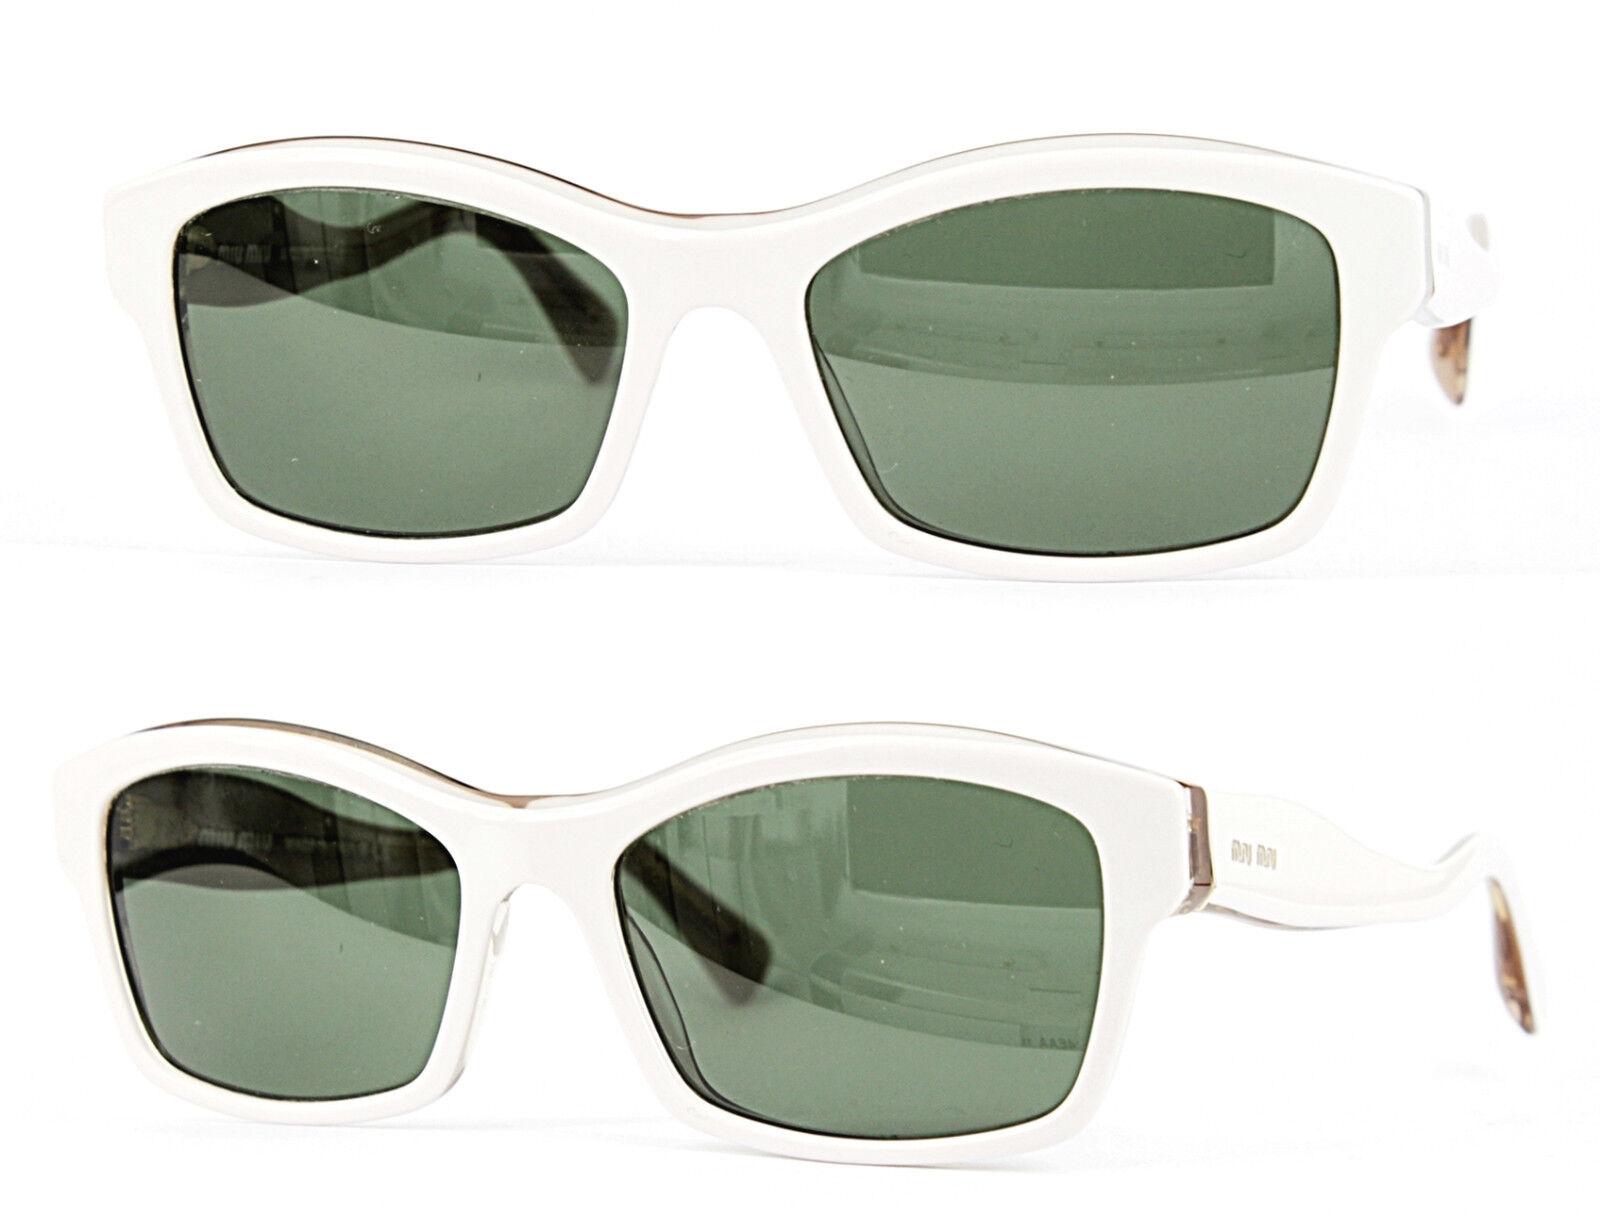 Miu Miu Sonnenbrille   Sunglasses  VMU02I  5216 HAF-1O1 140    272 | Angenehmes Gefühl